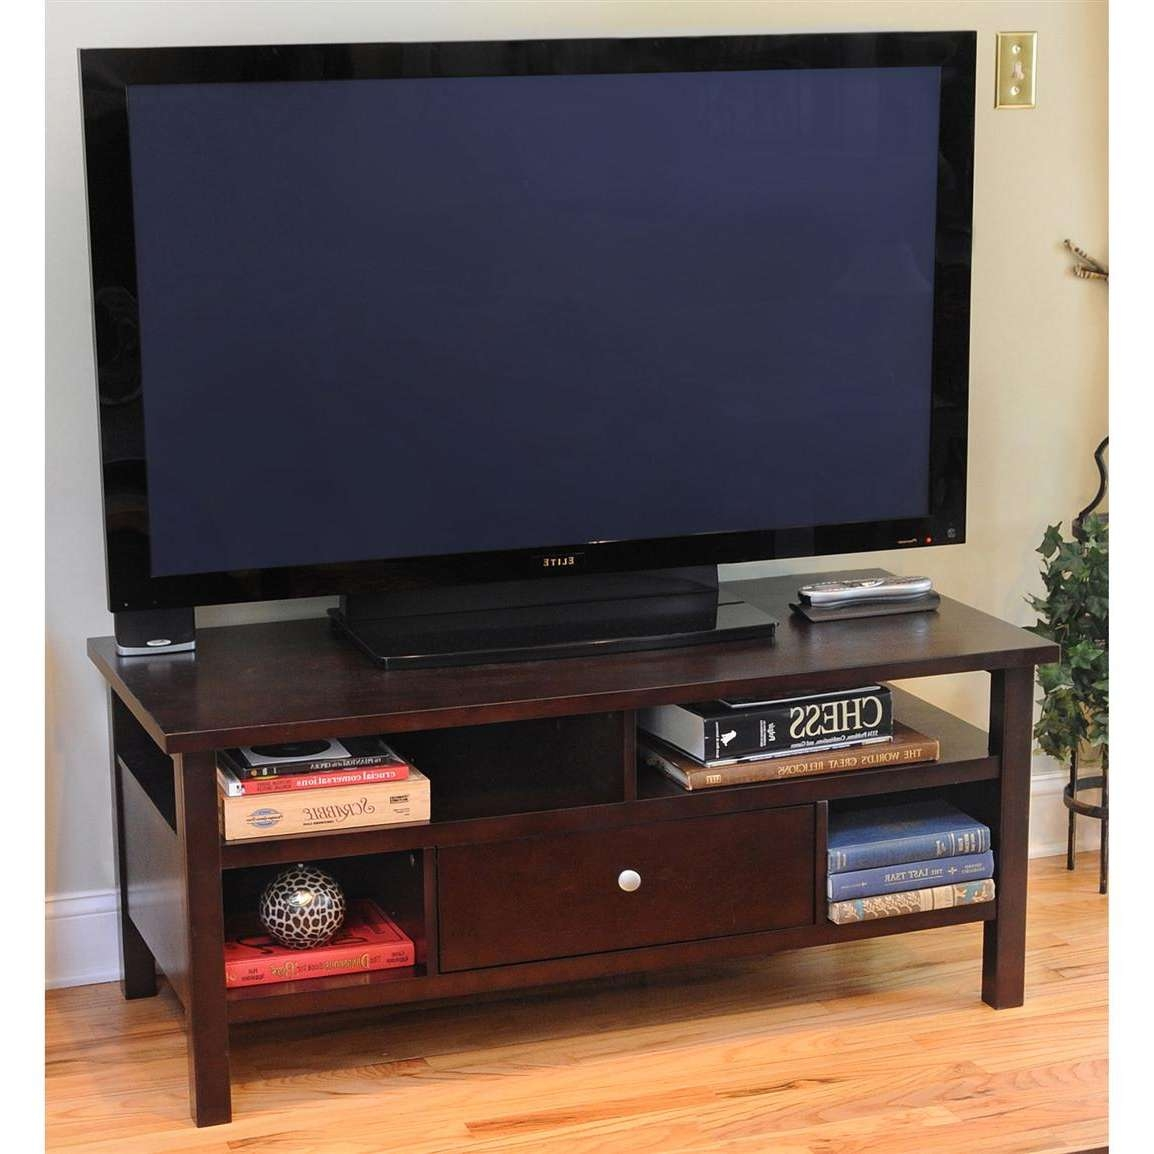 Innovative Flat Screen Tv Tall Flat Screen Tv Stand Home Design Regarding Wooden Tv Stands For Flat Screens (Gallery 10 of 15)